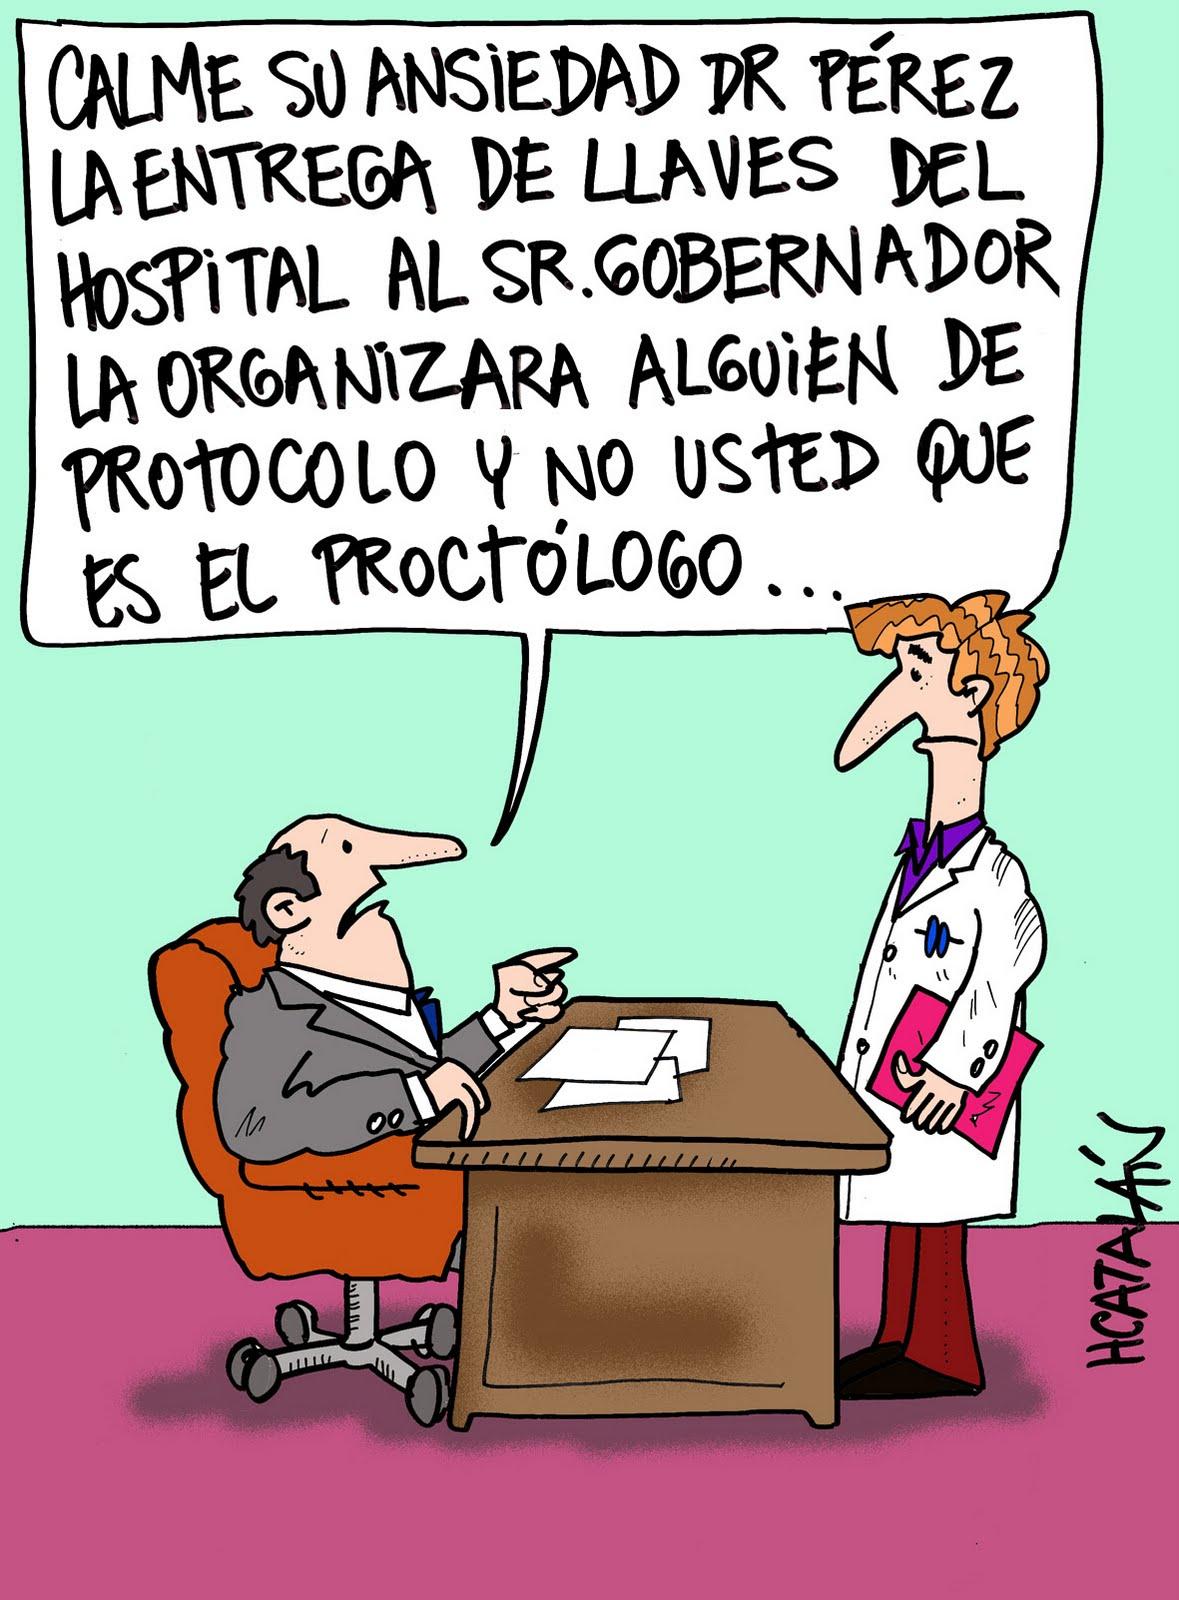 hospital espanol cordoba: